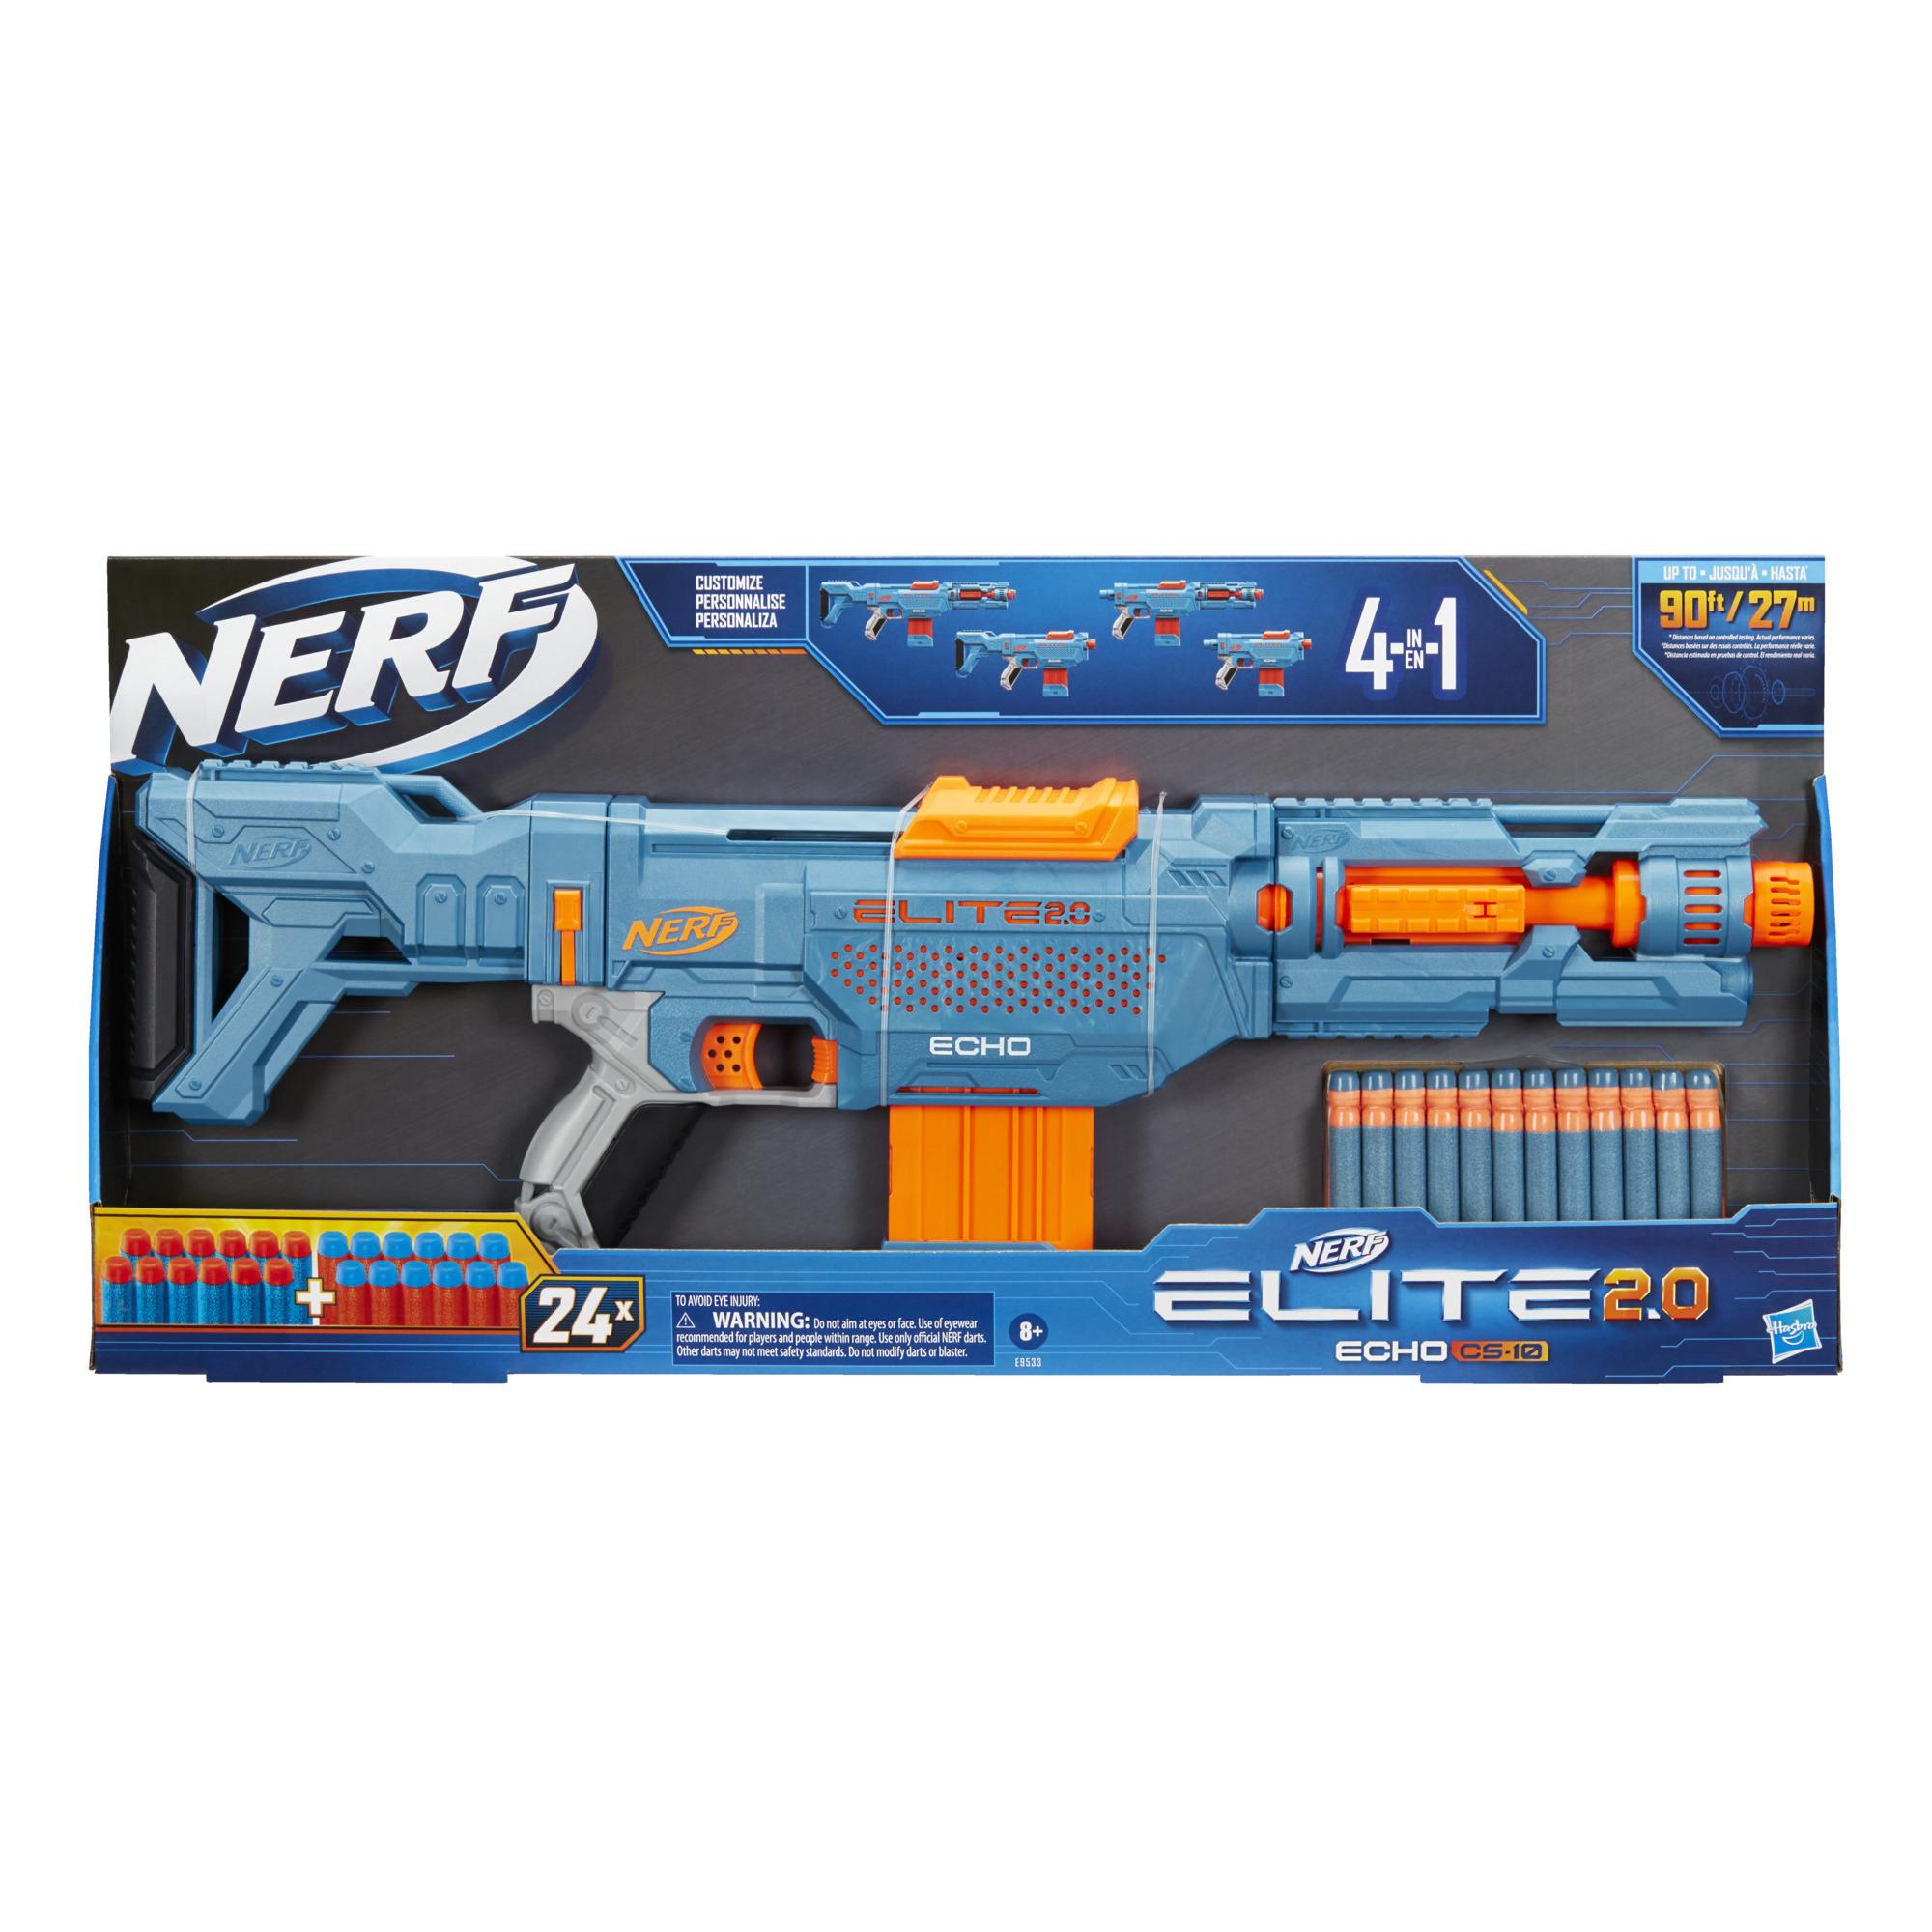 Nerf Elite 2.0 Echo CS-10 Blaster, 24 Nerf Darts, 10-Dart Clip, Removable Stock and Barrel Extension, 4 Tactical Rails